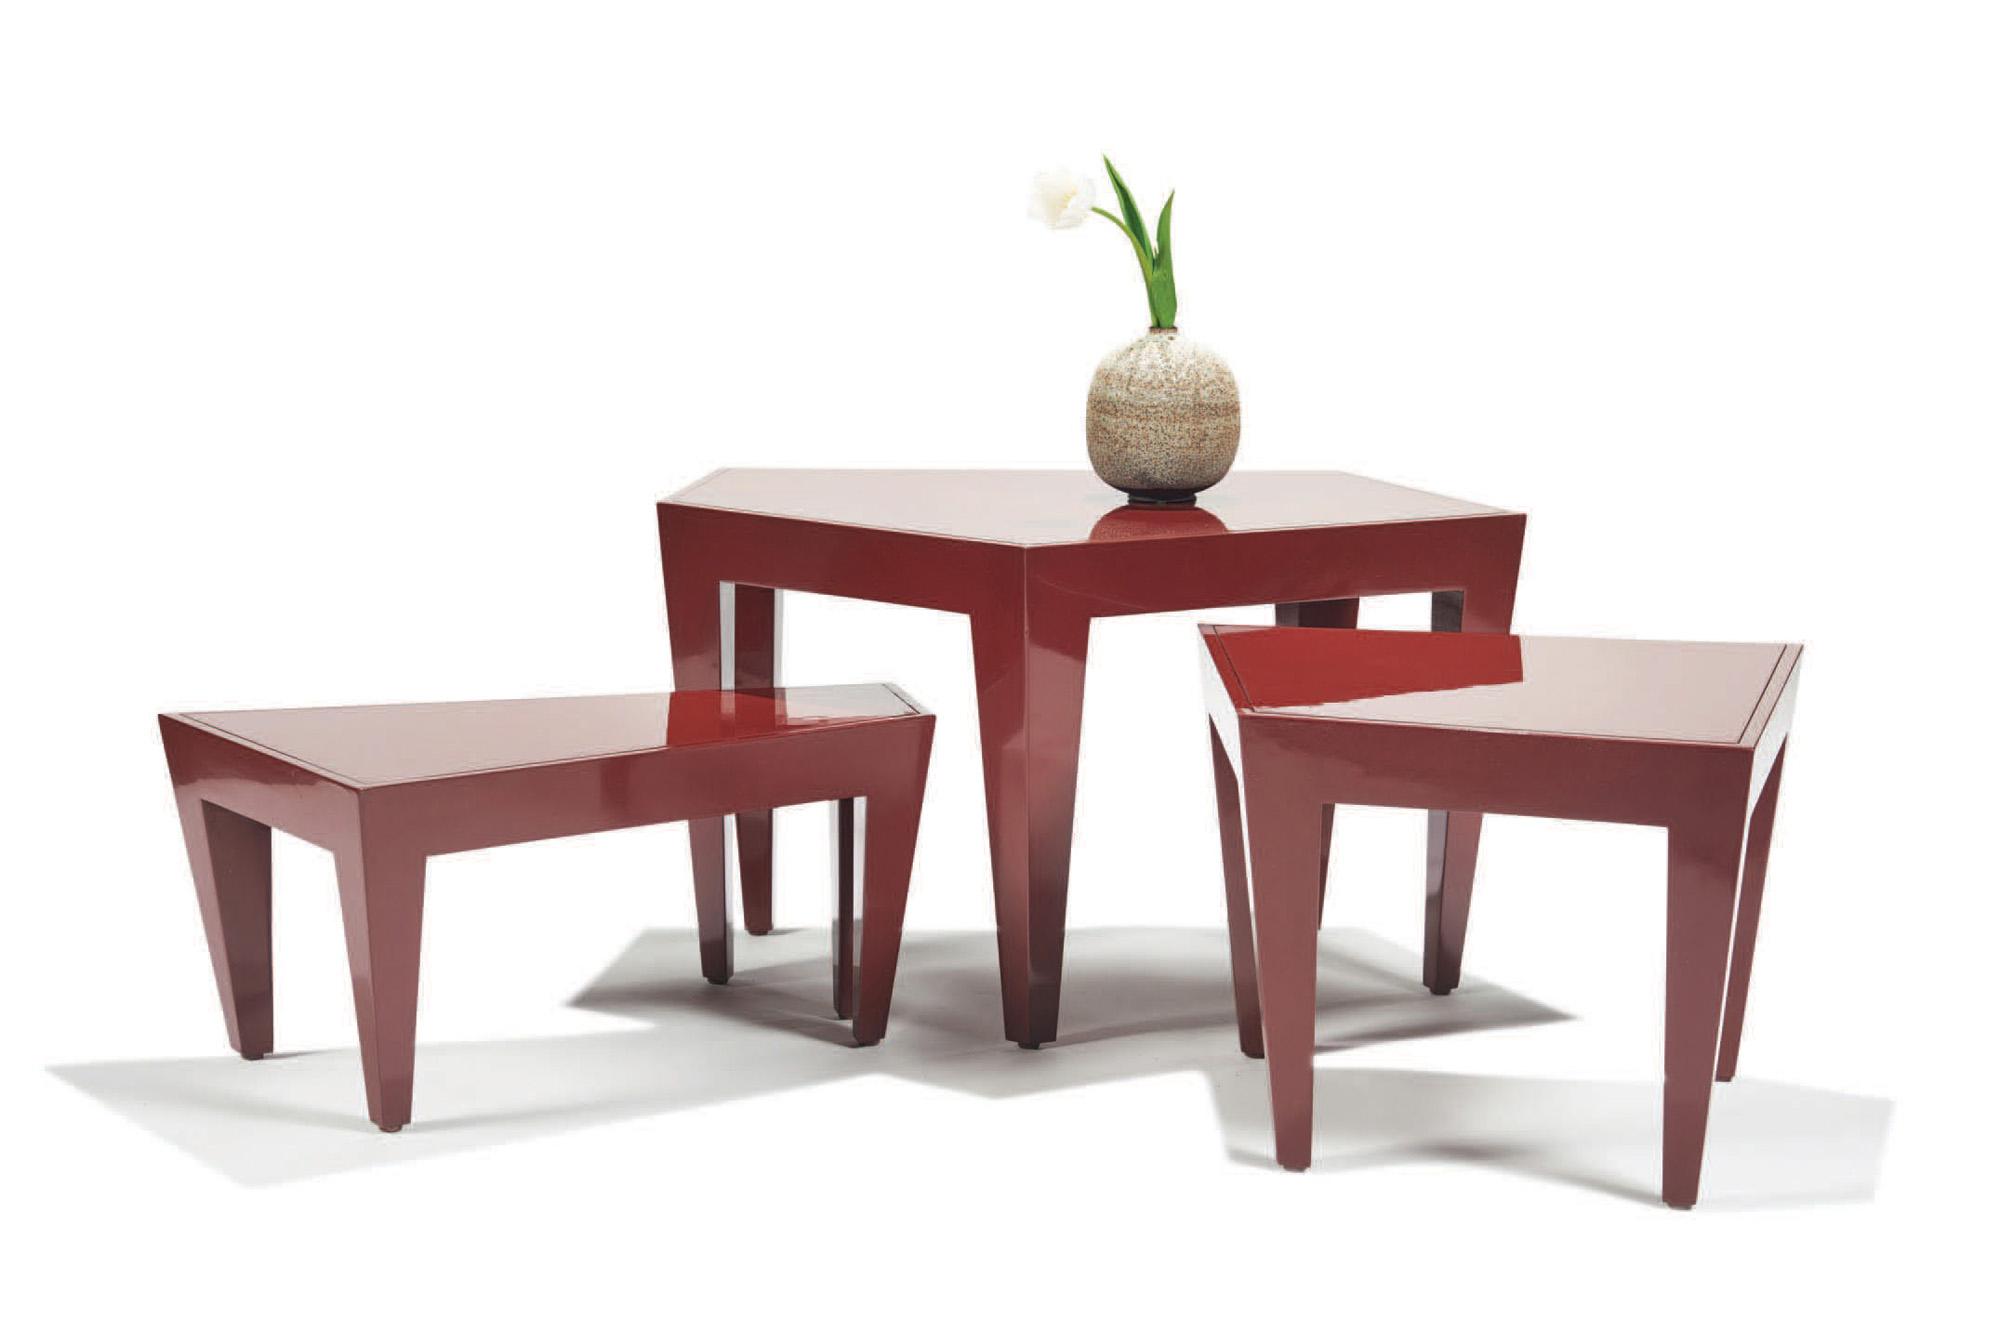 GEODE NESTING TABLES